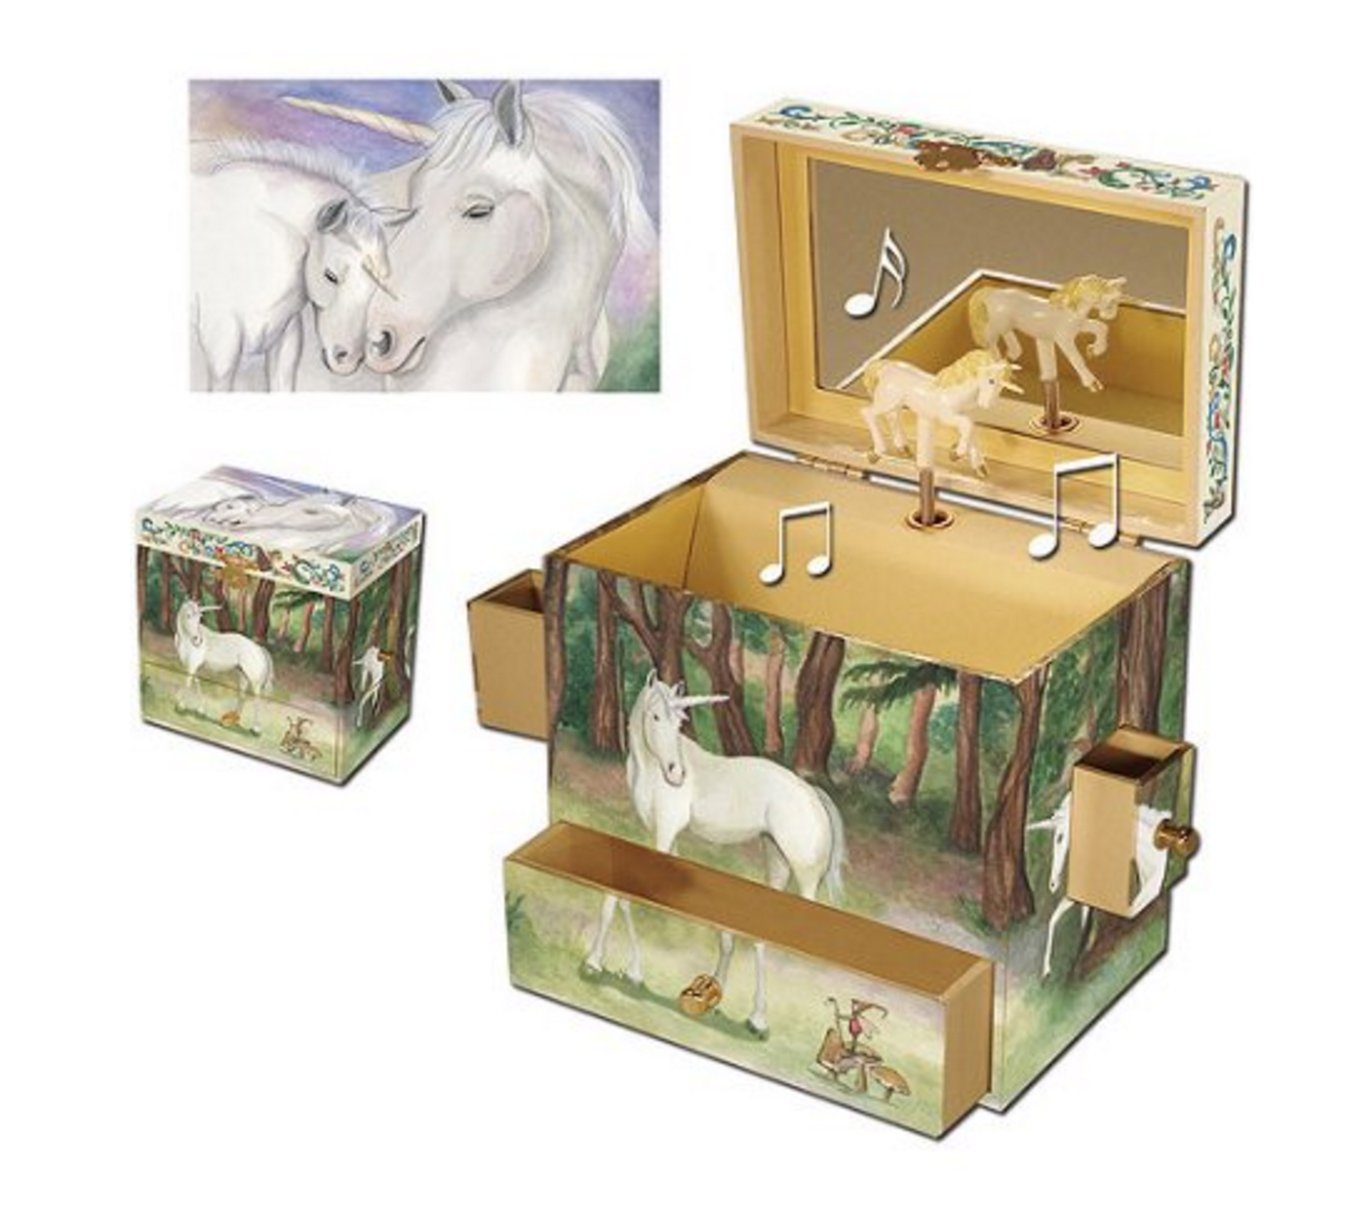 Amazoncom Childs Unicorn Musical Jewelry Box Toys Games